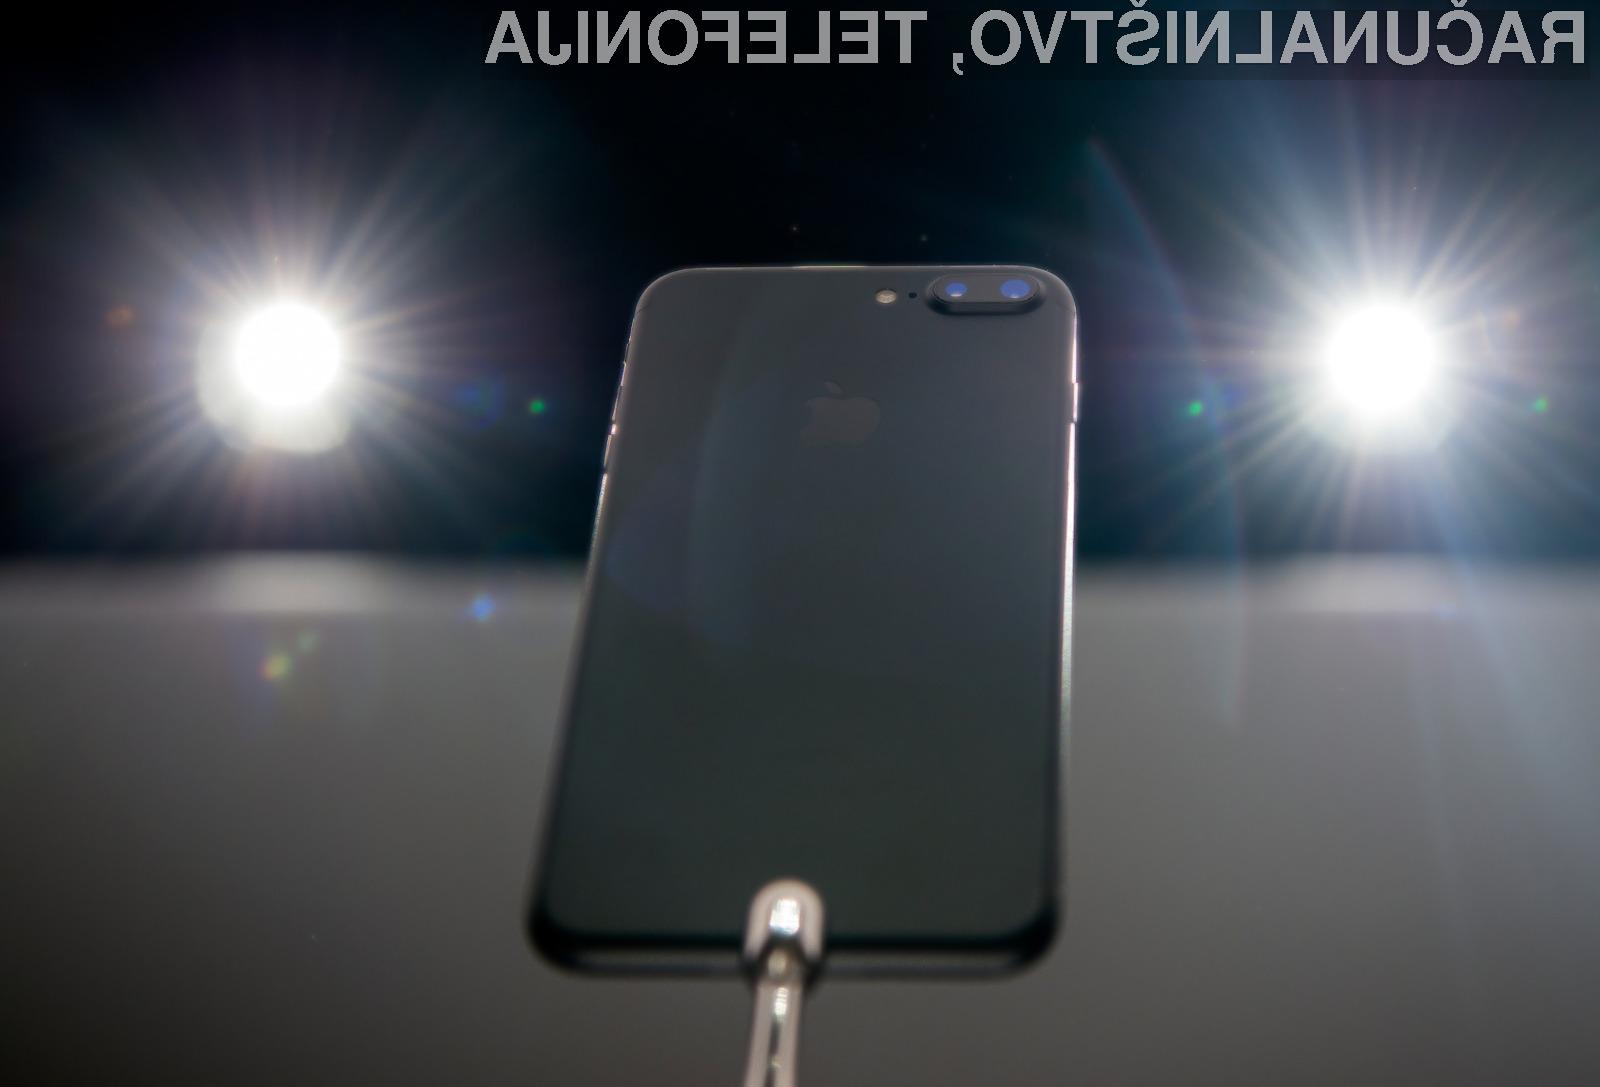 Novi telefon Apple iPhone 8 bo precej dražji od konkurence!